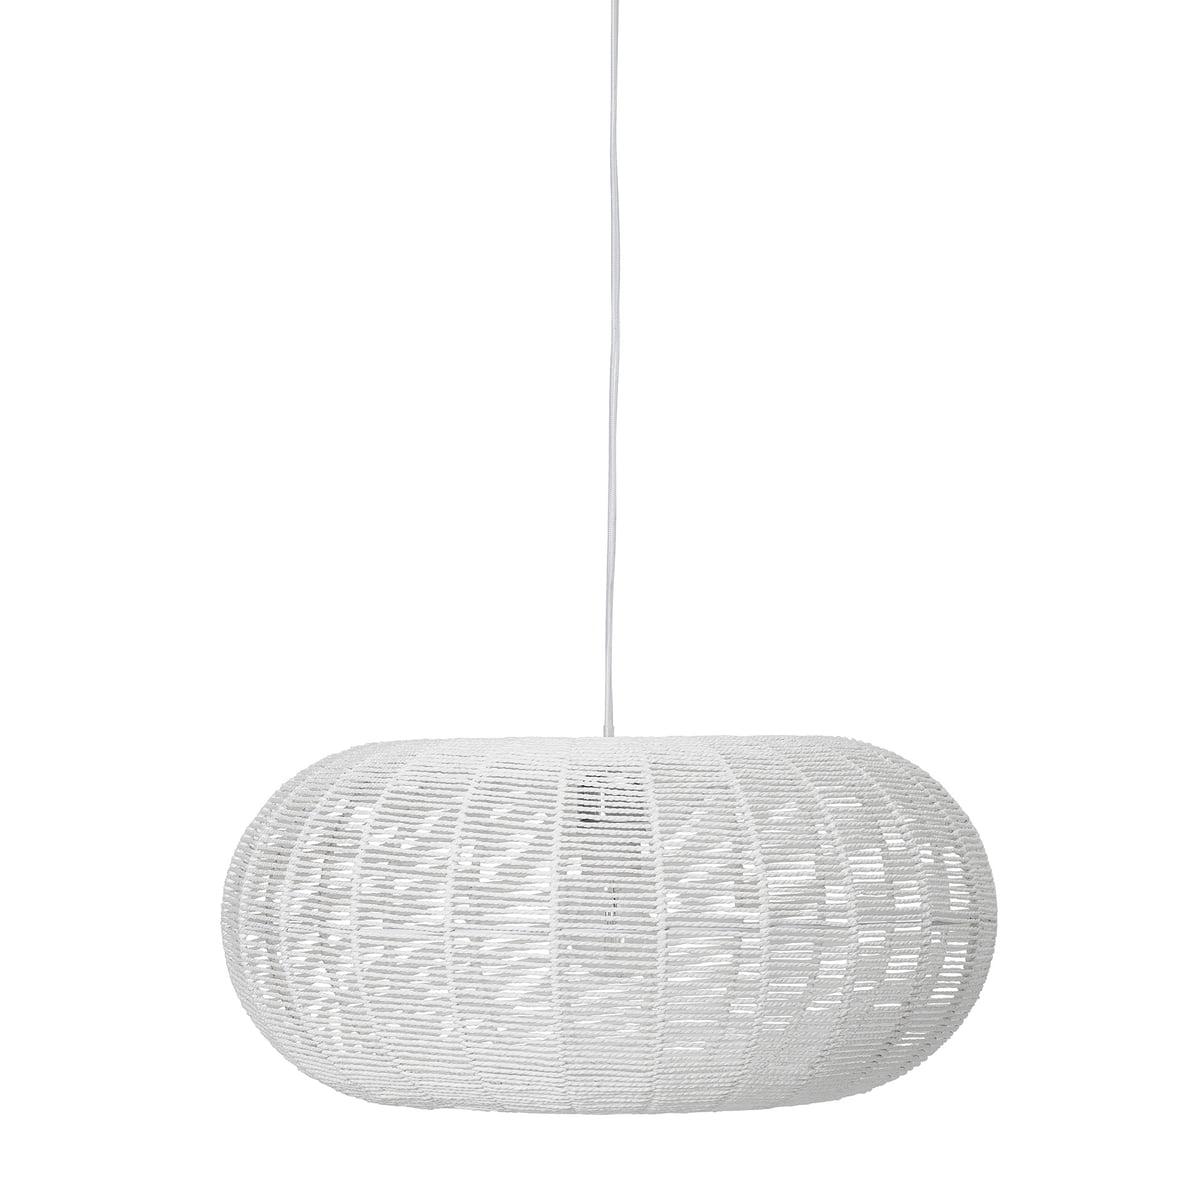 Bloomingville - Pendelleuchte aus Papier, Ø 50 x H 23 cm, weiß